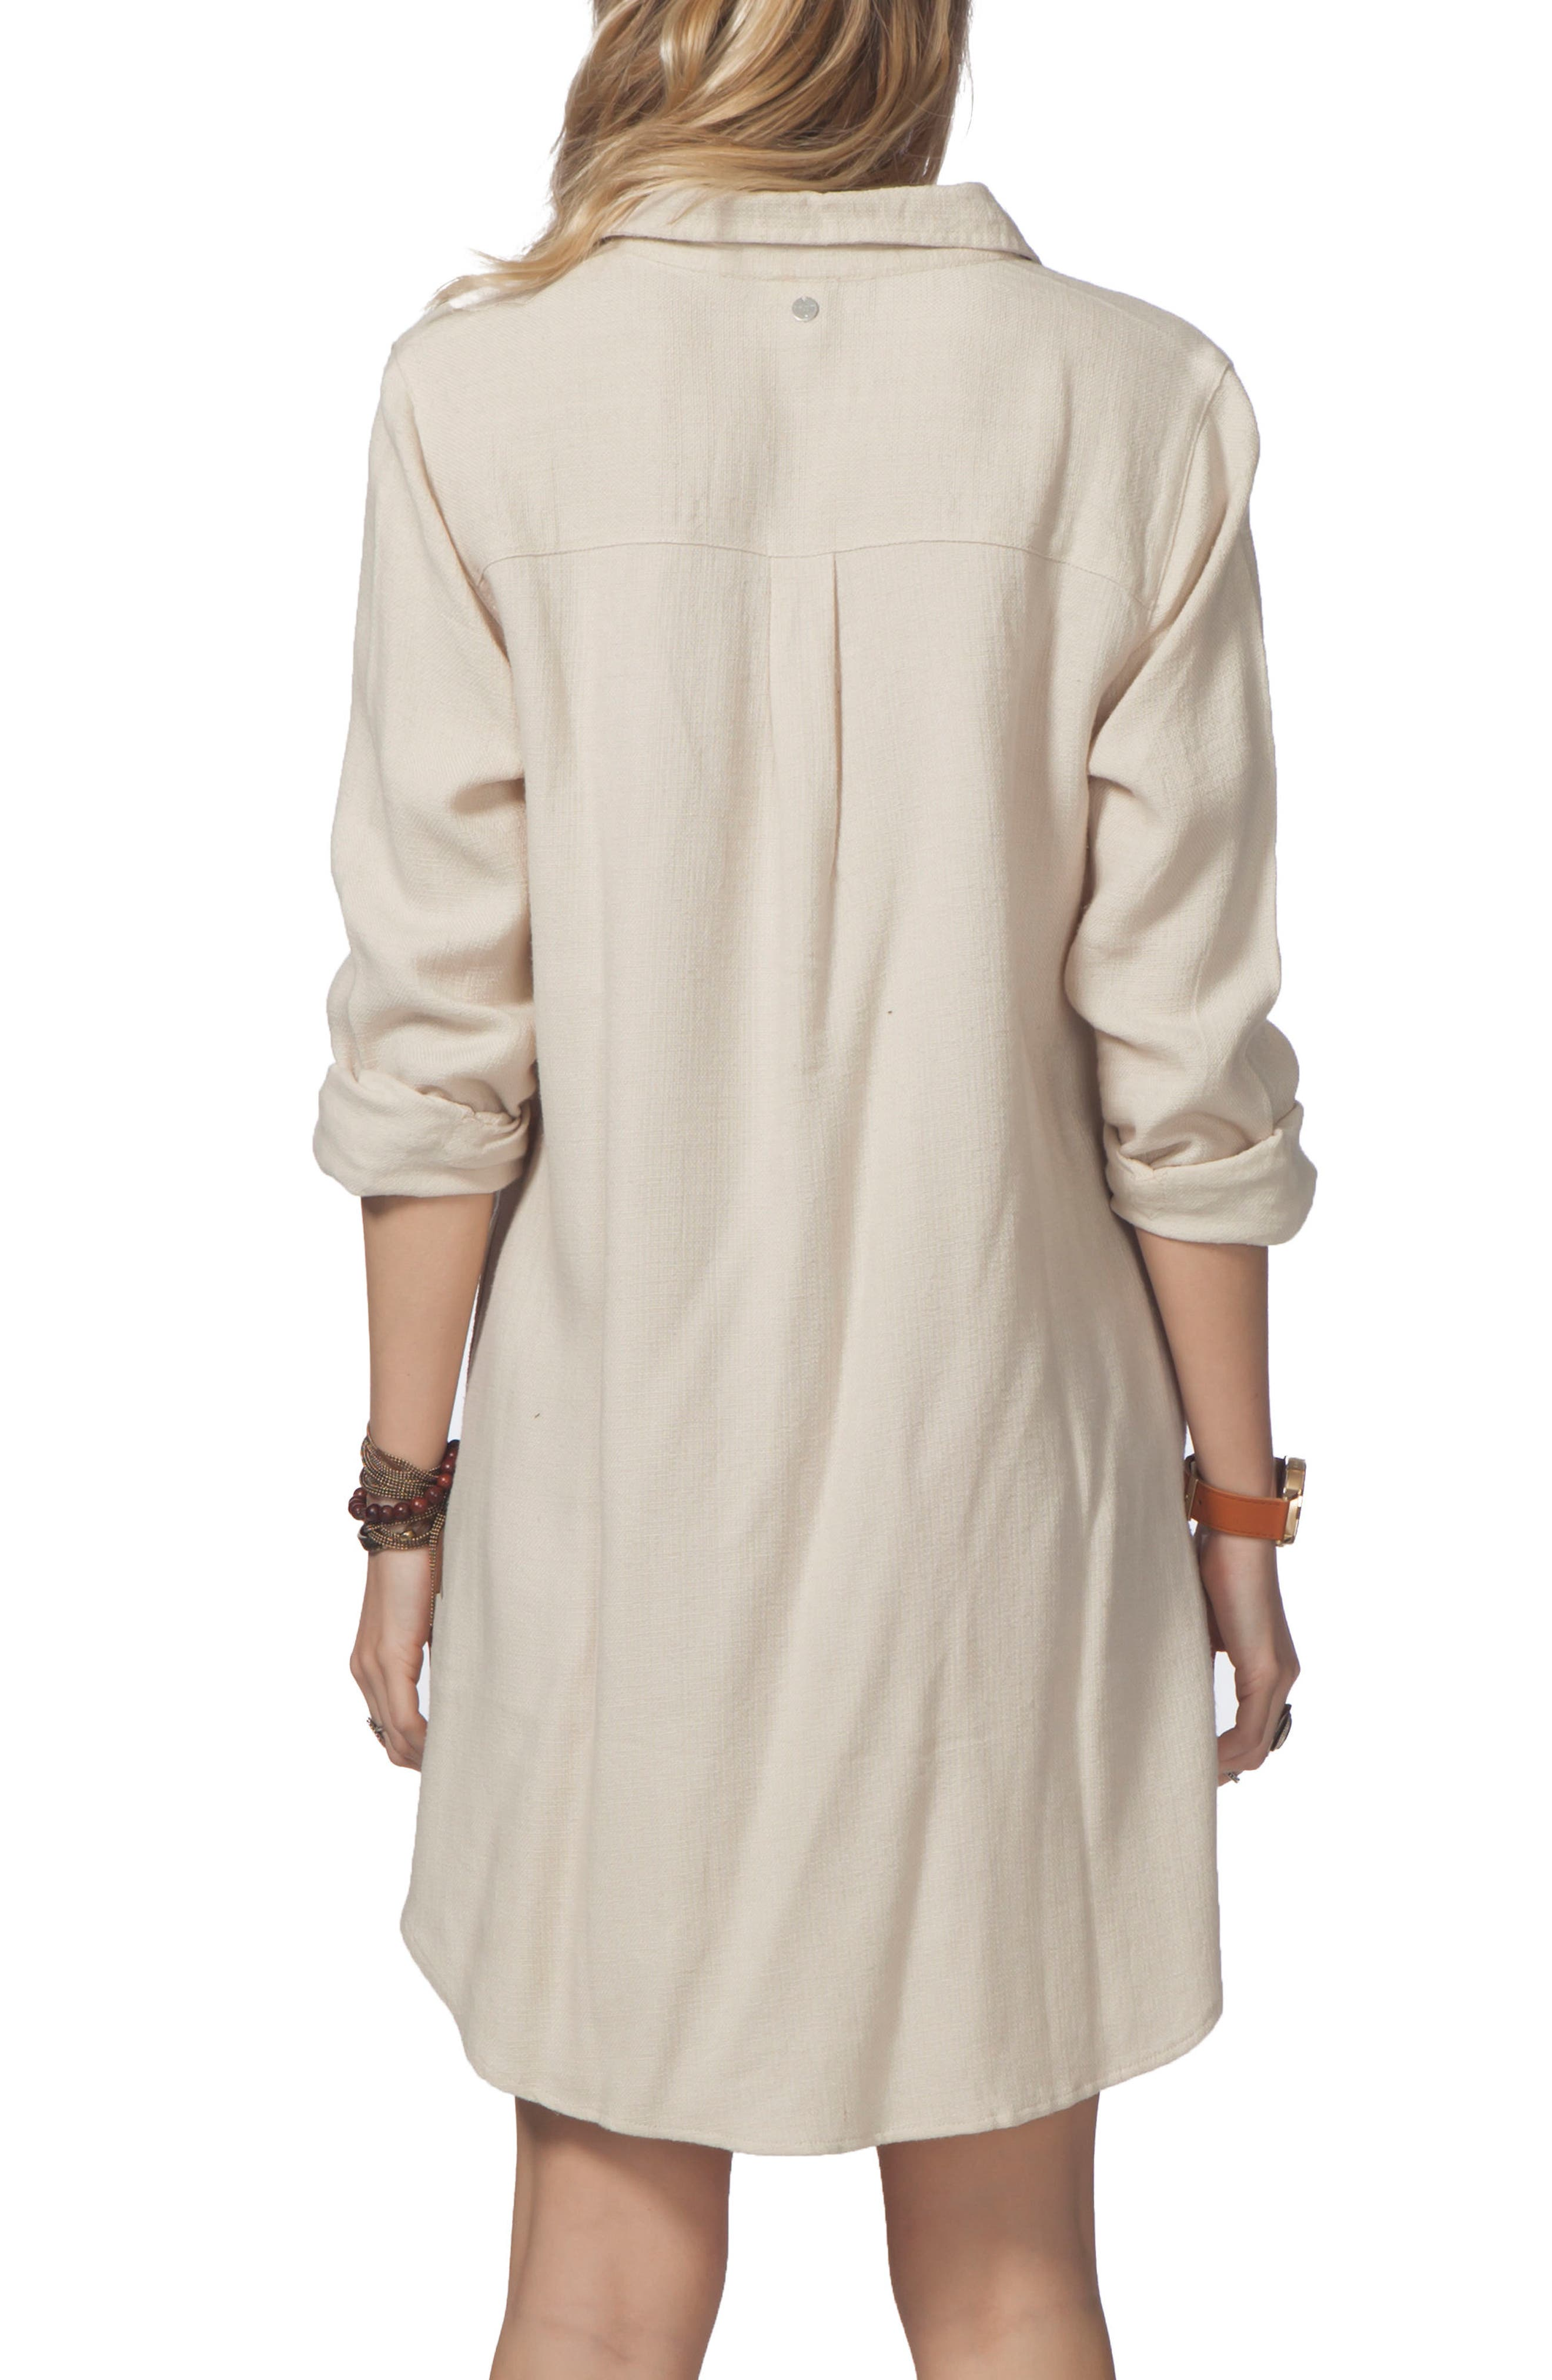 Ri Curl Lizzie Shirtdress,                             Alternate thumbnail 2, color,                             901